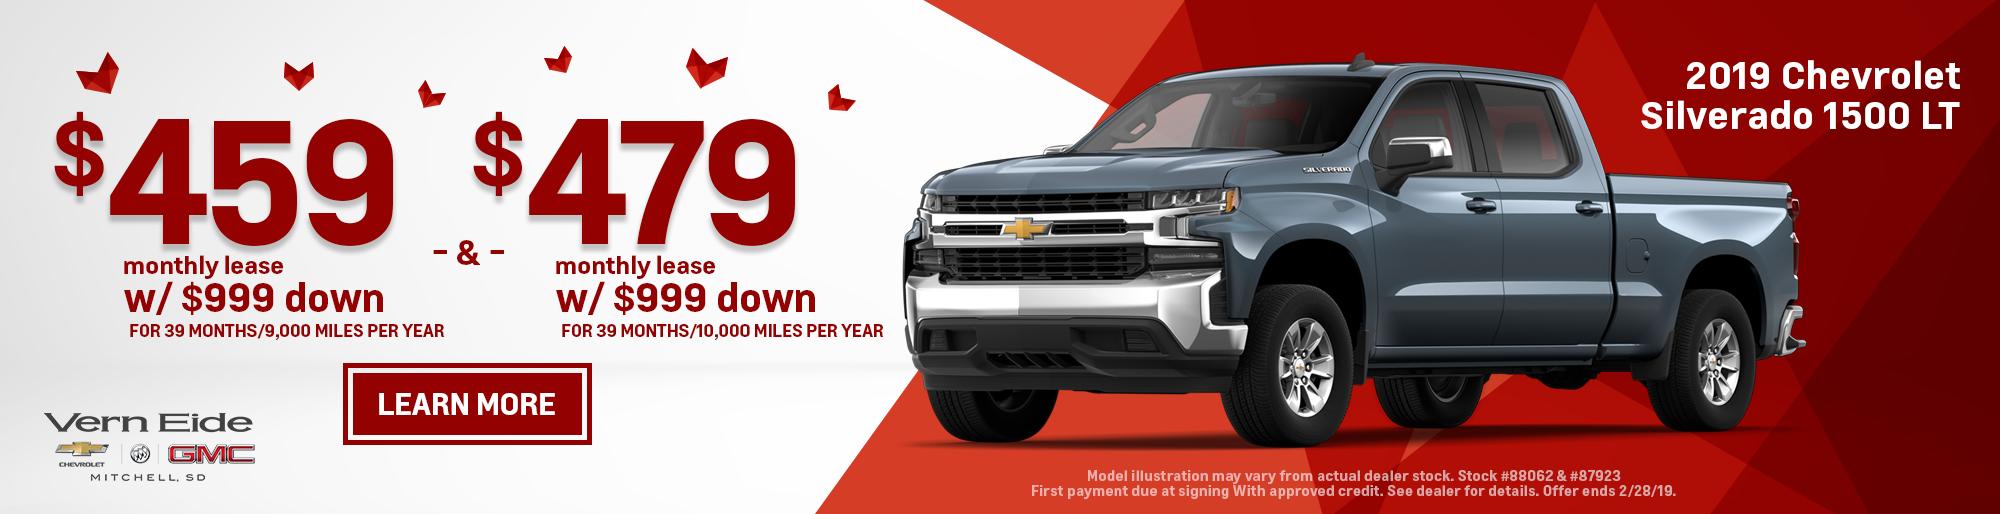 GM - Silverado Leases - Feb 2019